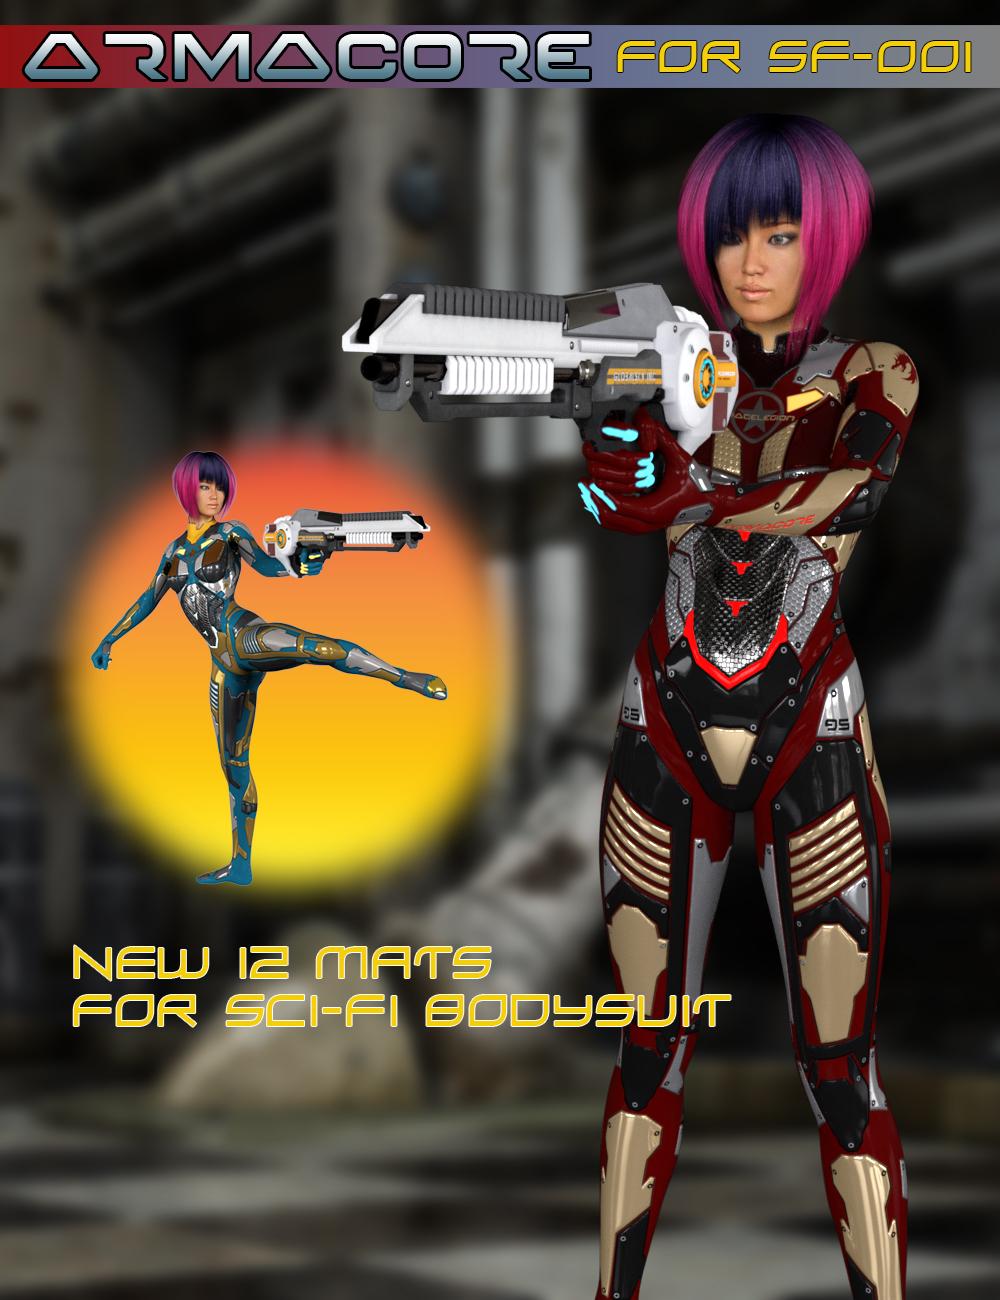 Slide3D Armacore for Sci-Fi Body Suit SF-001 by: Slide3D, 3D Models by Daz 3D